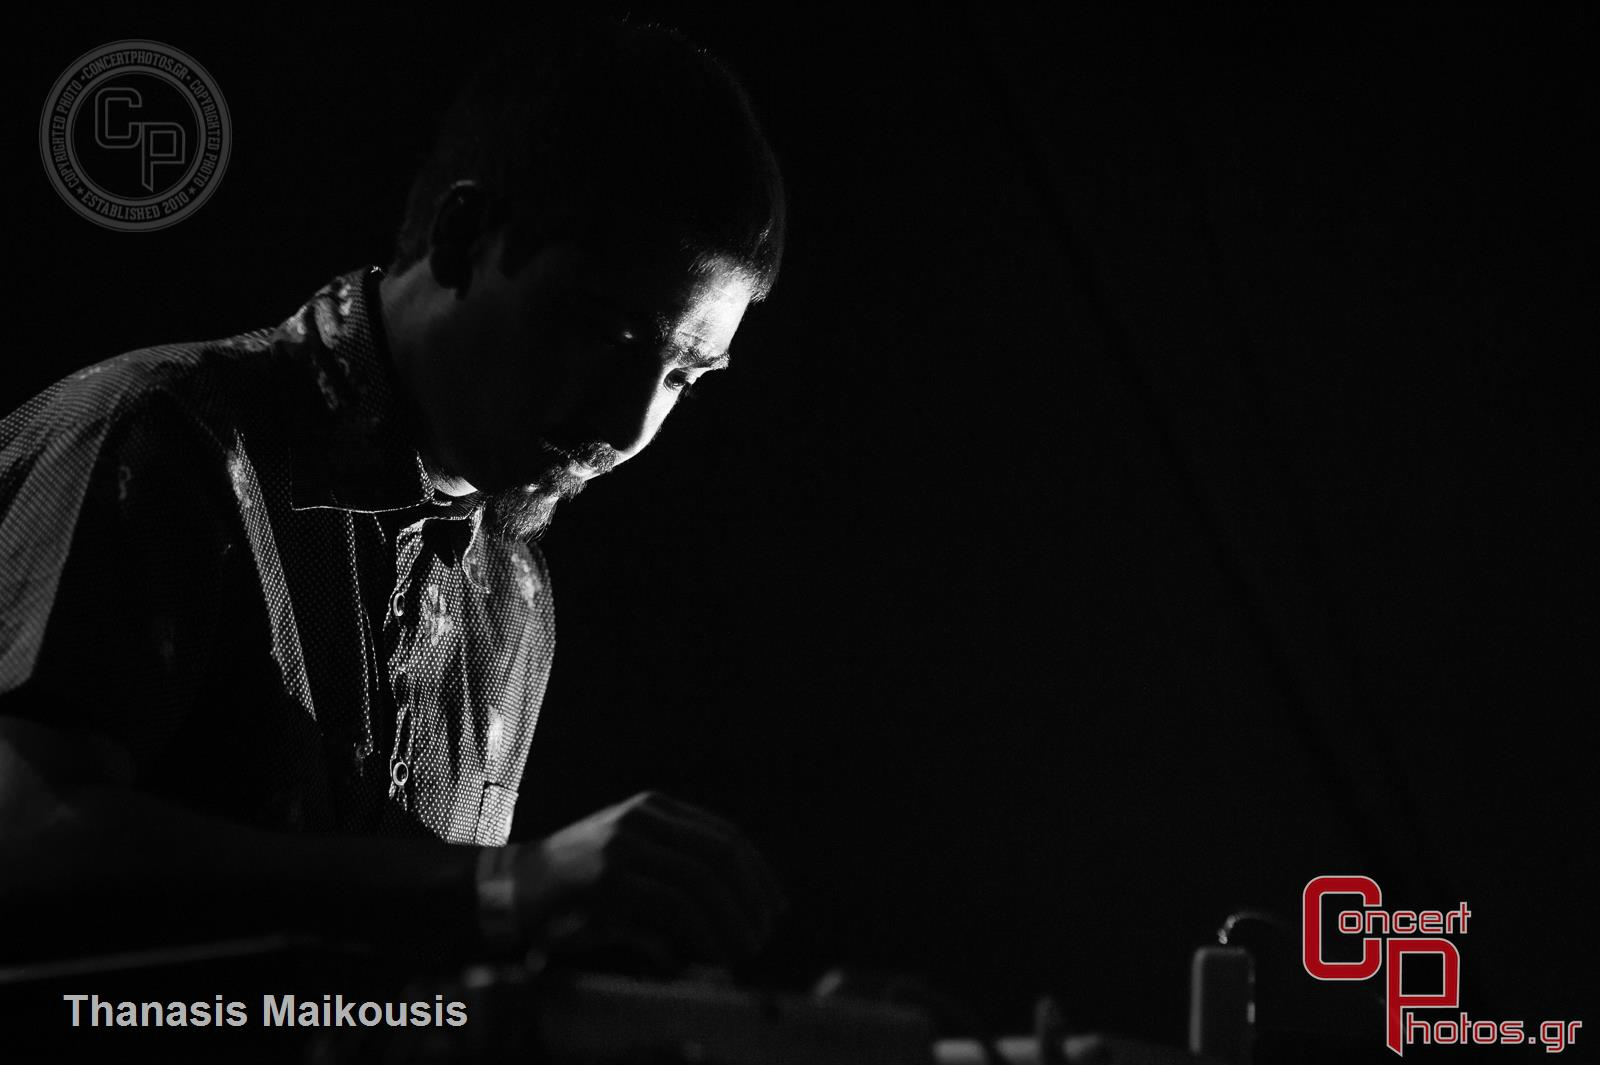 Quantic & Kill Emil -Quantic Kill Emil Gagarin photographer: Thanasis Maikousis - ConcertPhotos - 20141023_2142_15